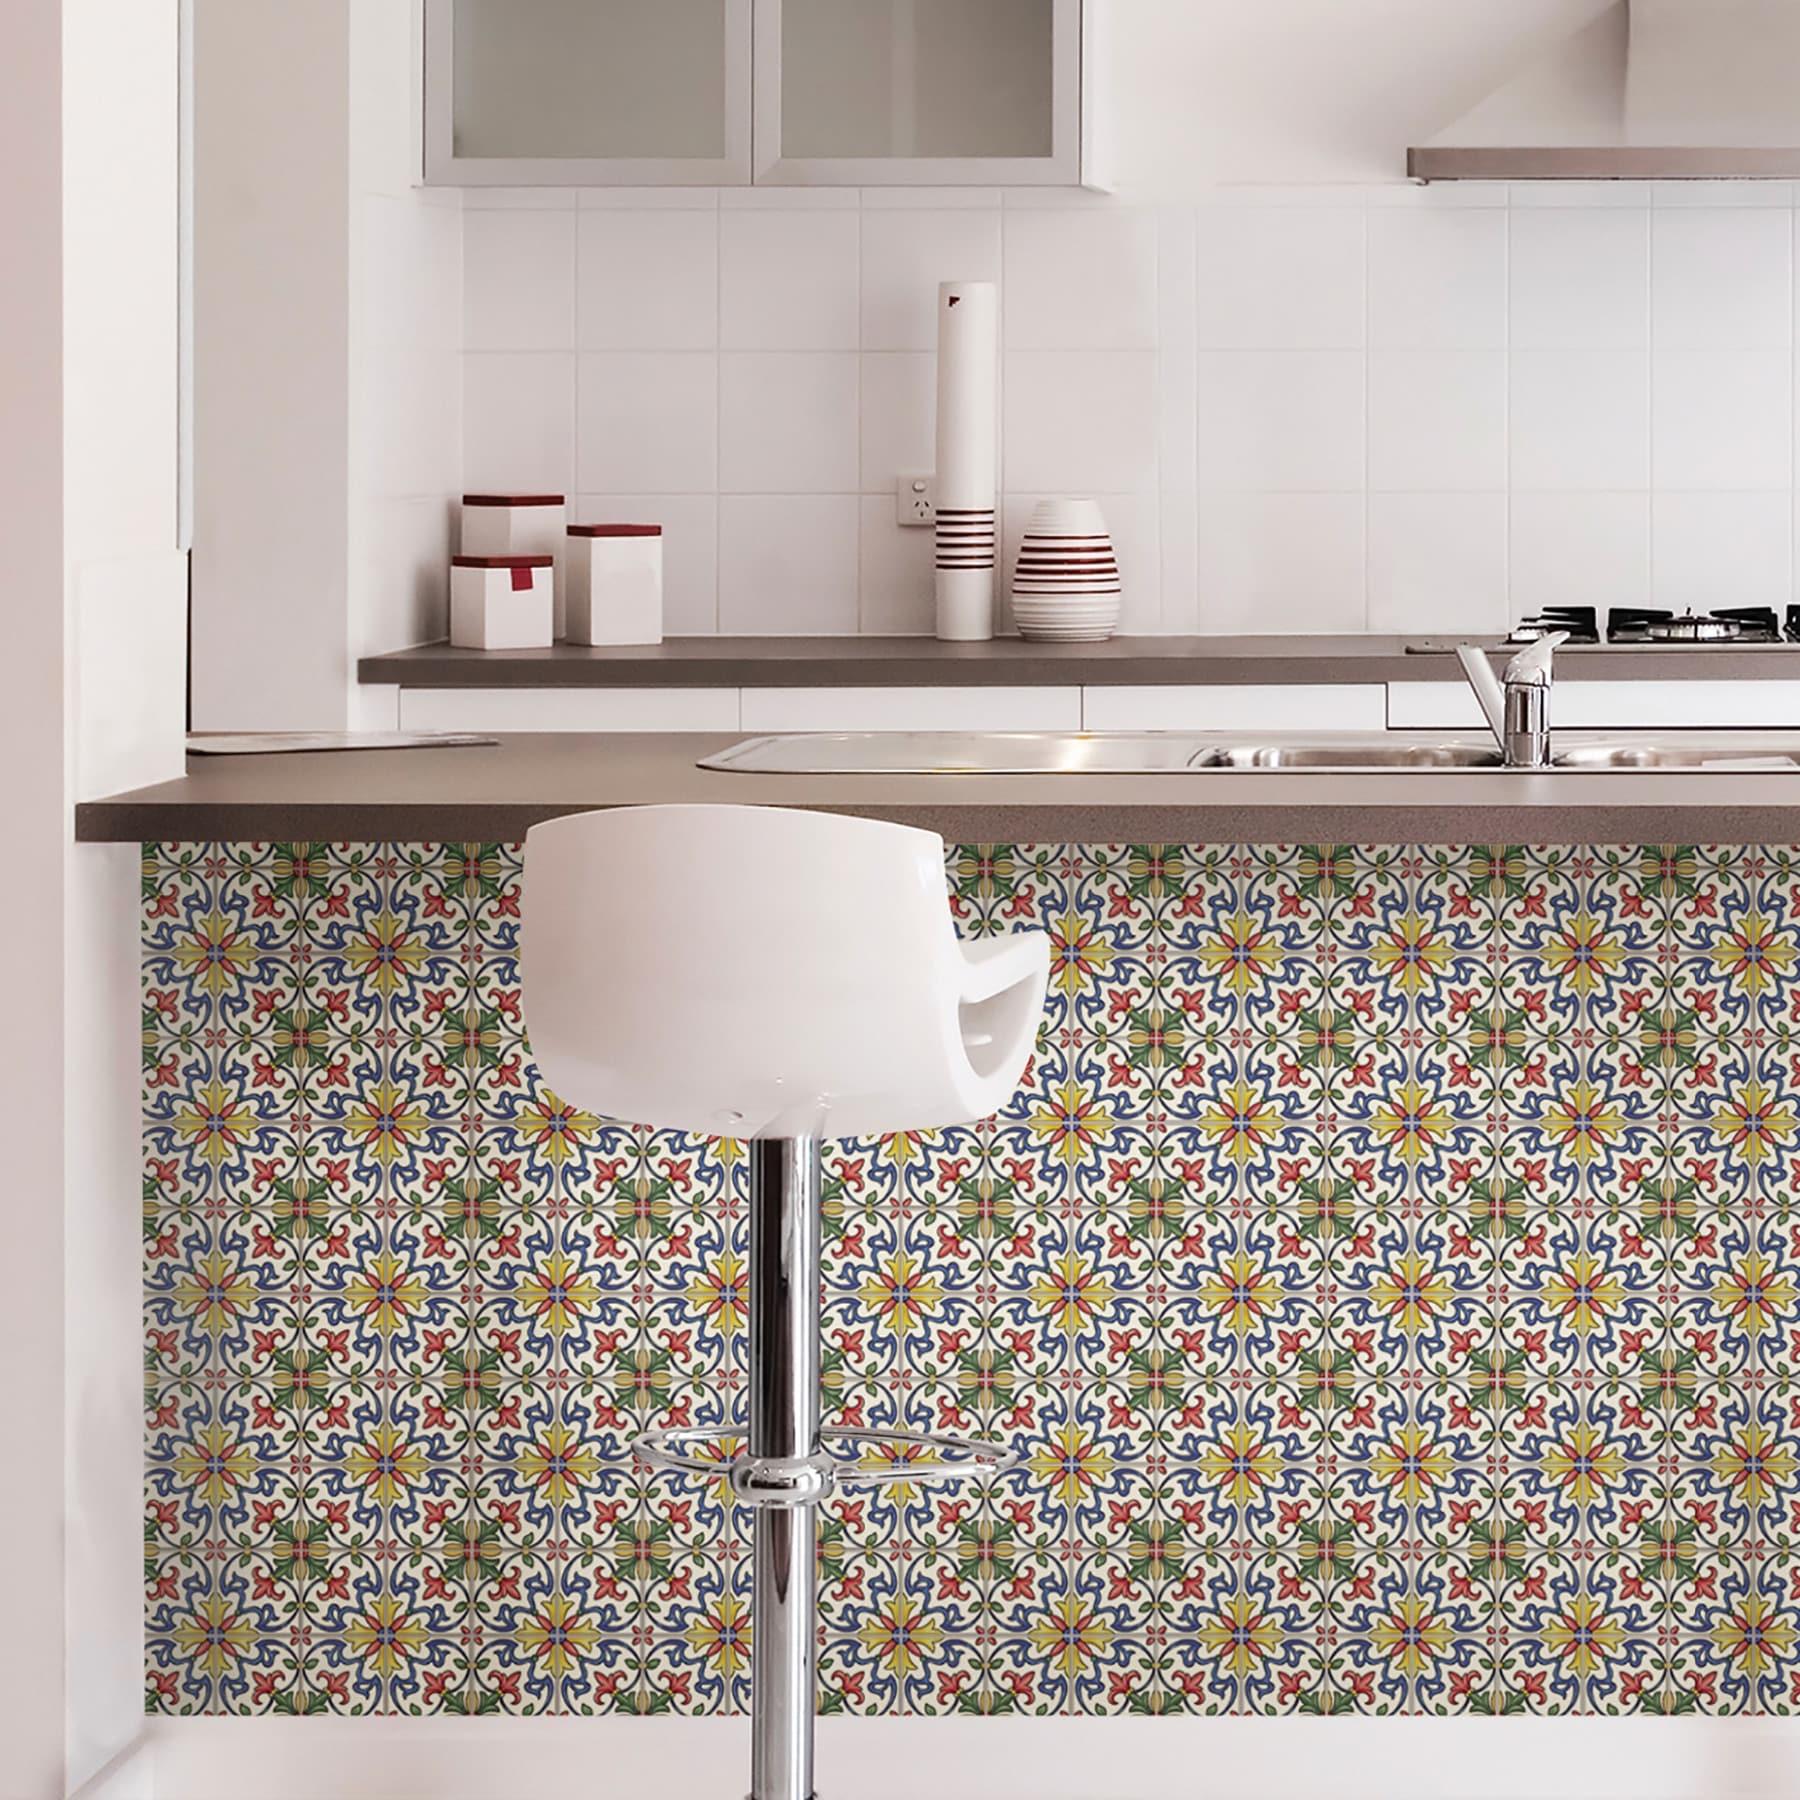 Brewster Nh2365 Tuscan 10 X Square Fl Self Adhesive Resin L And Stick Backsplash Tiles Multi Colored